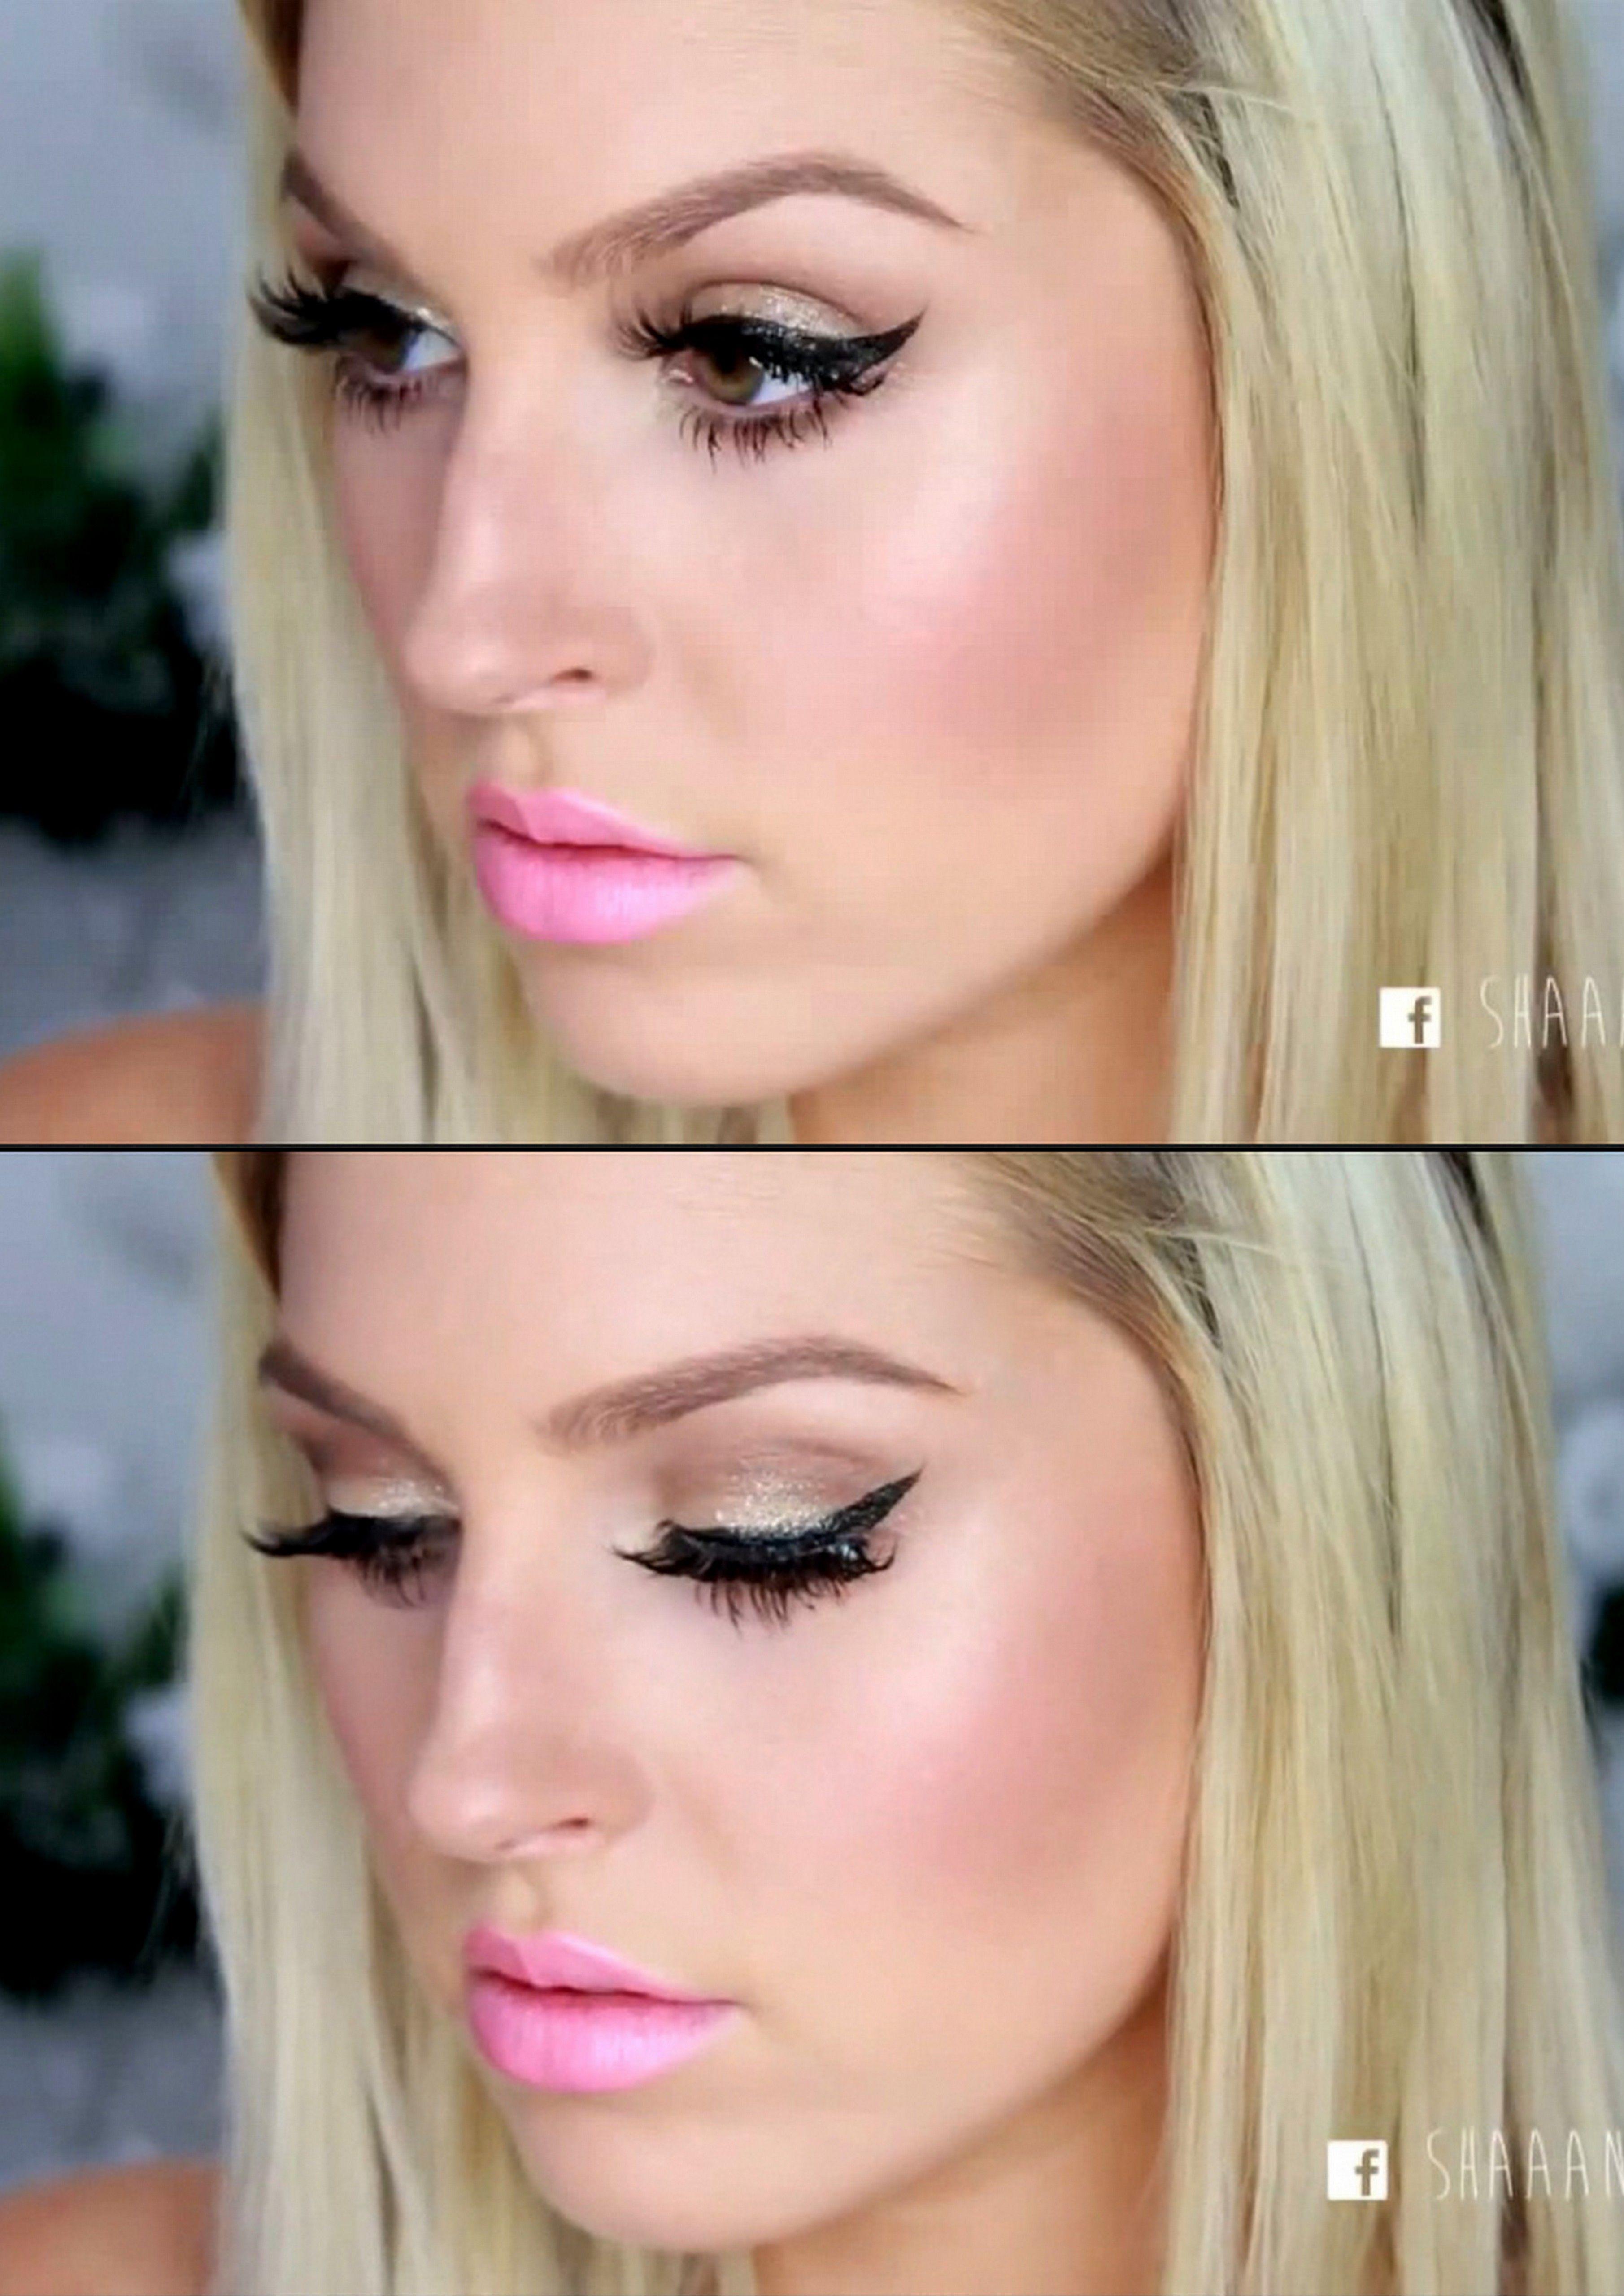 girly clubbing makeup xoshaaan winged eyeliner, pink